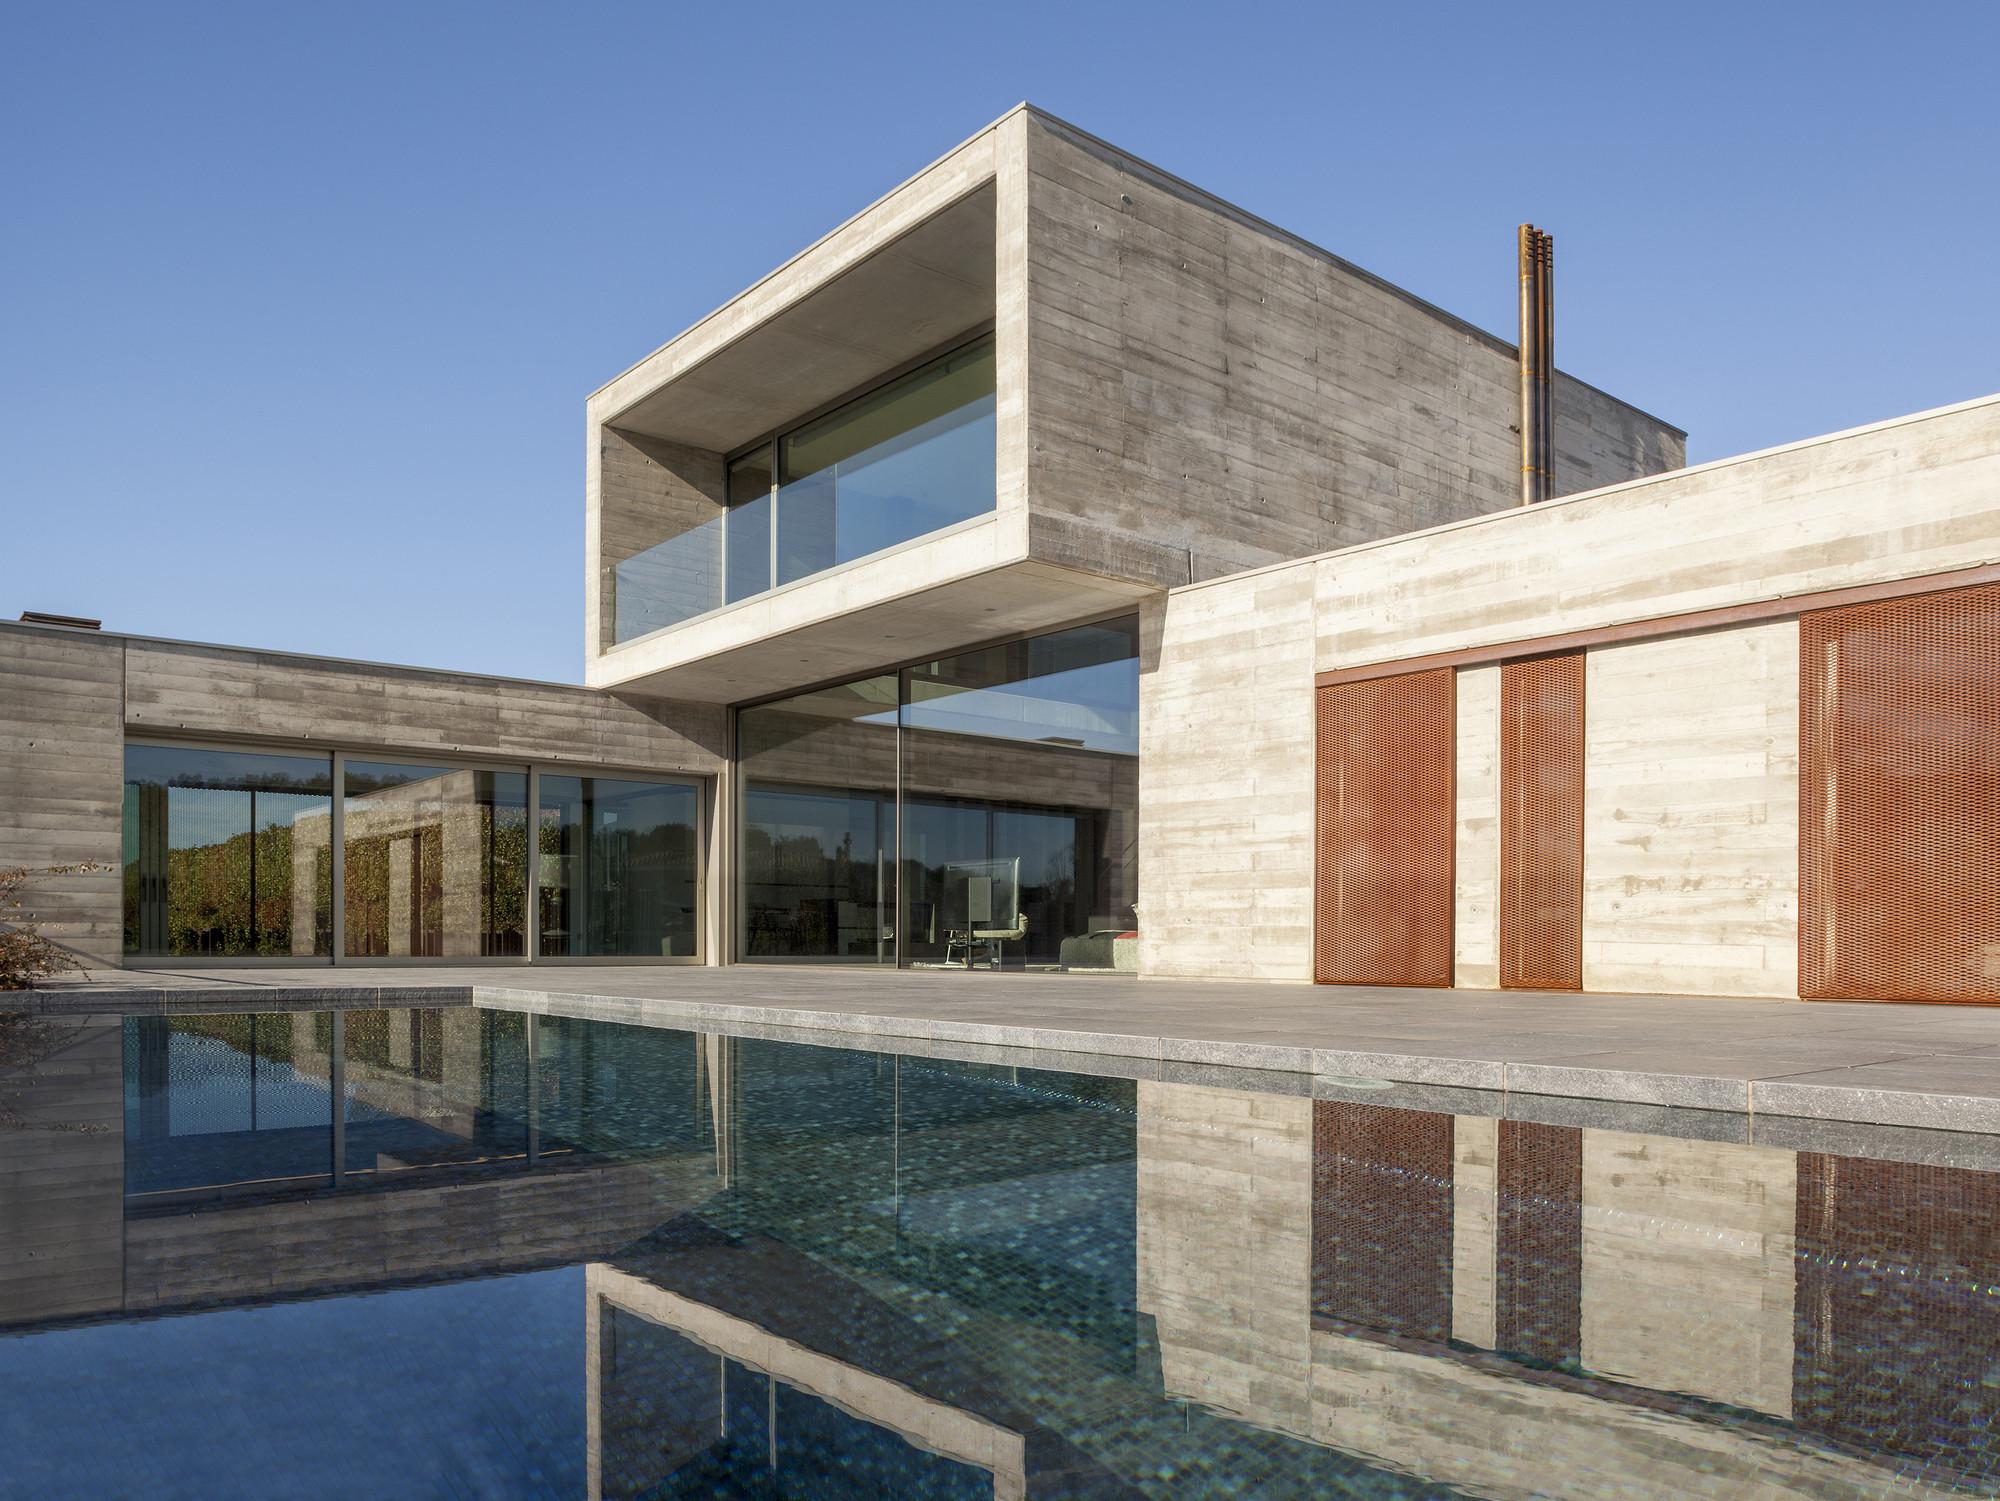 Casa en Cassà / Ricard Galiana + Yago Oliva, © Nani Pujol